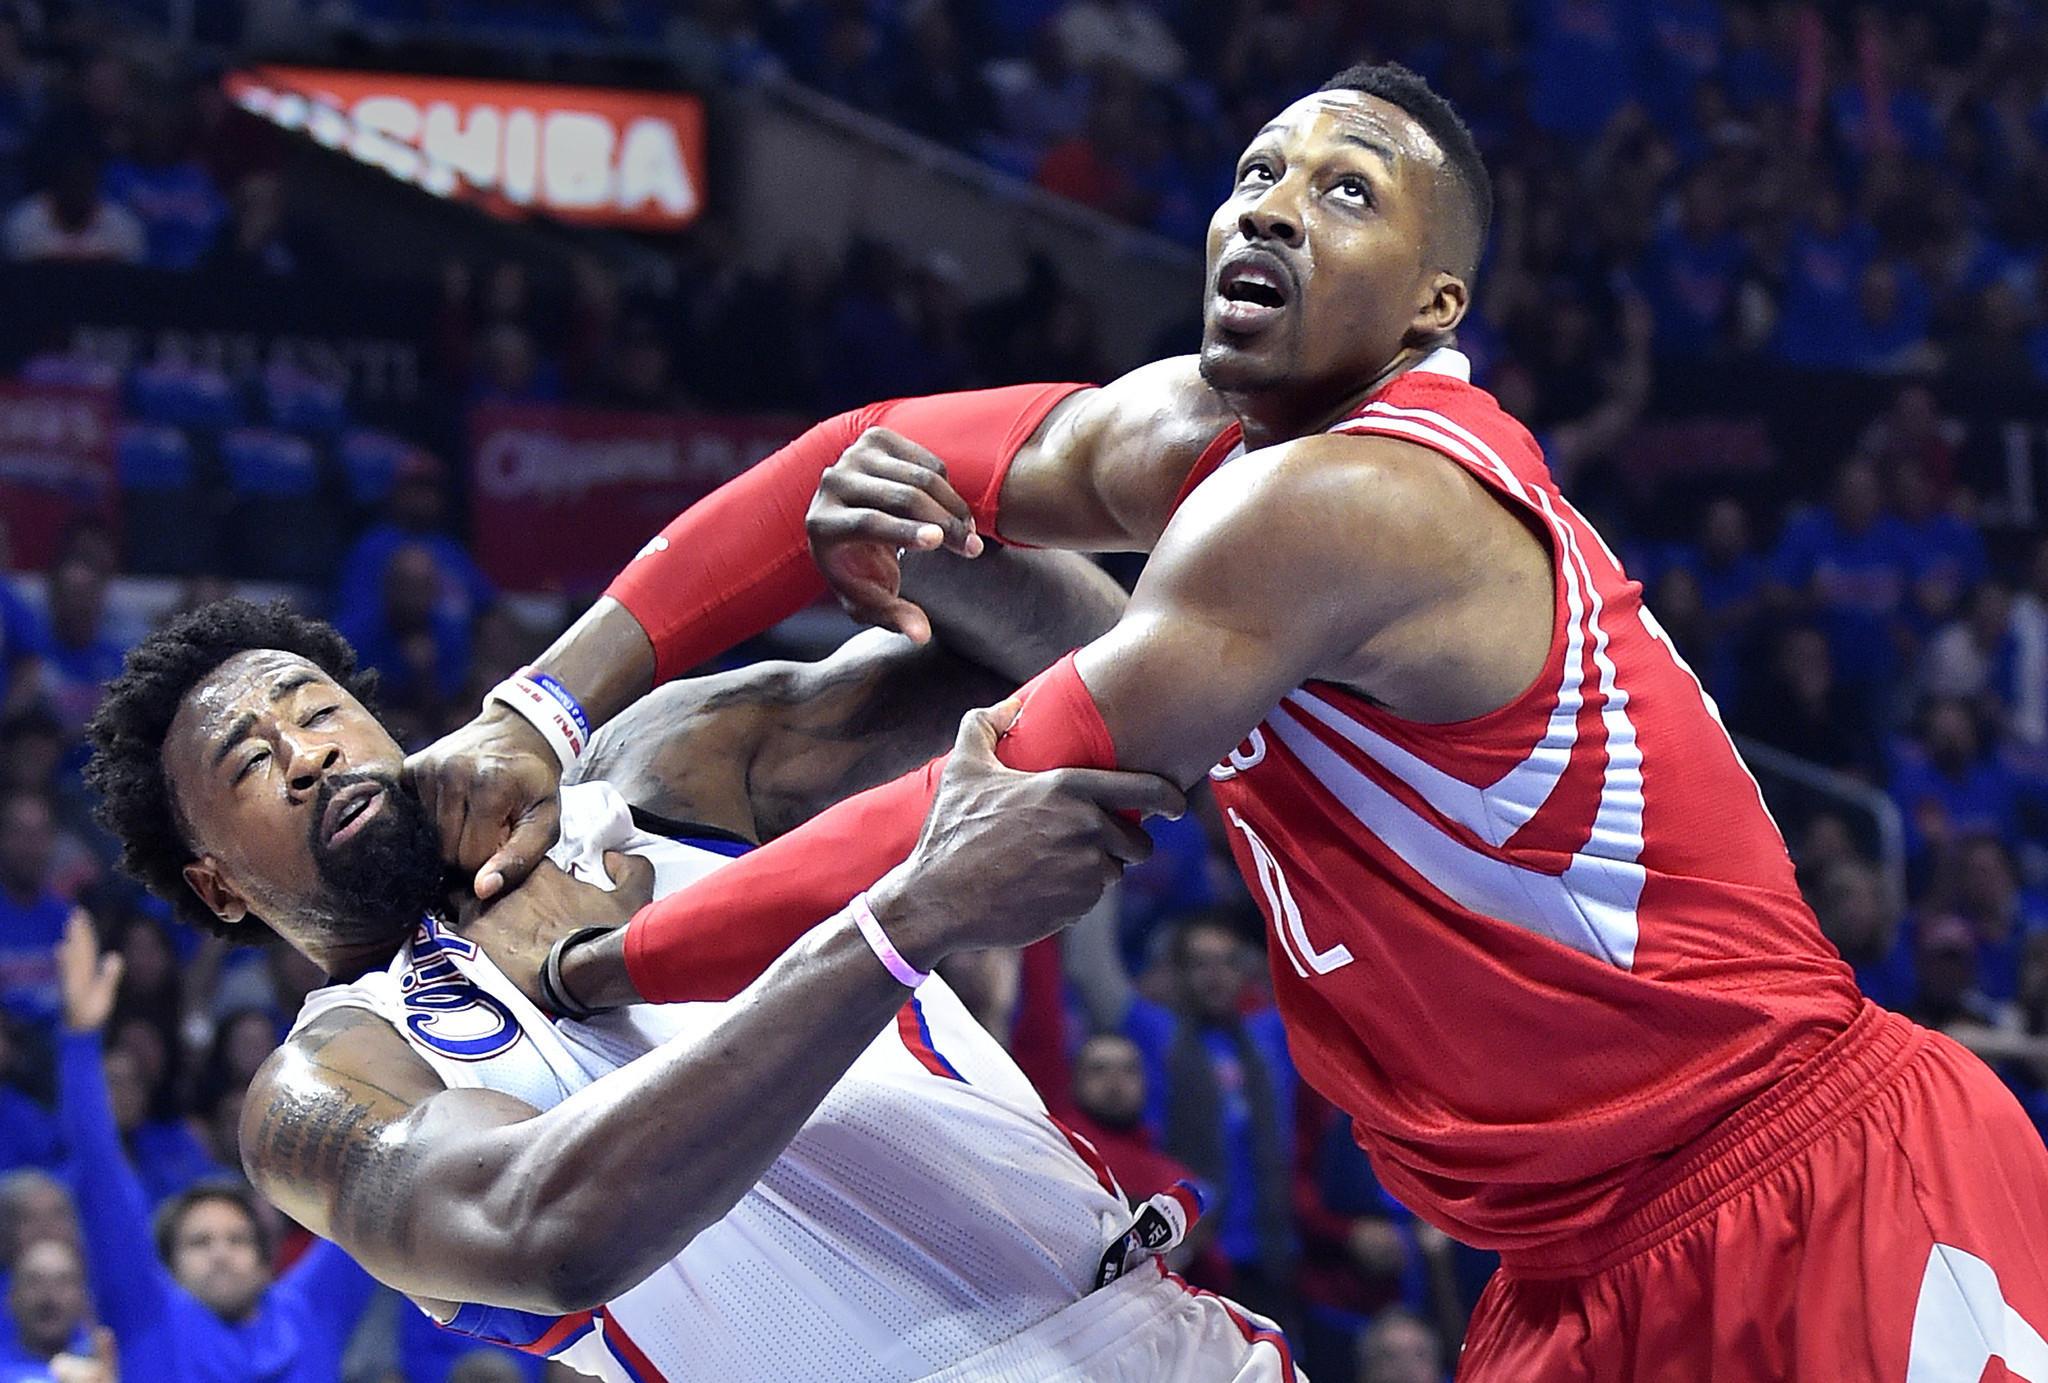 Live updates: Rockets defeat the Clippers, 119-107 - LA TimesRockets Game